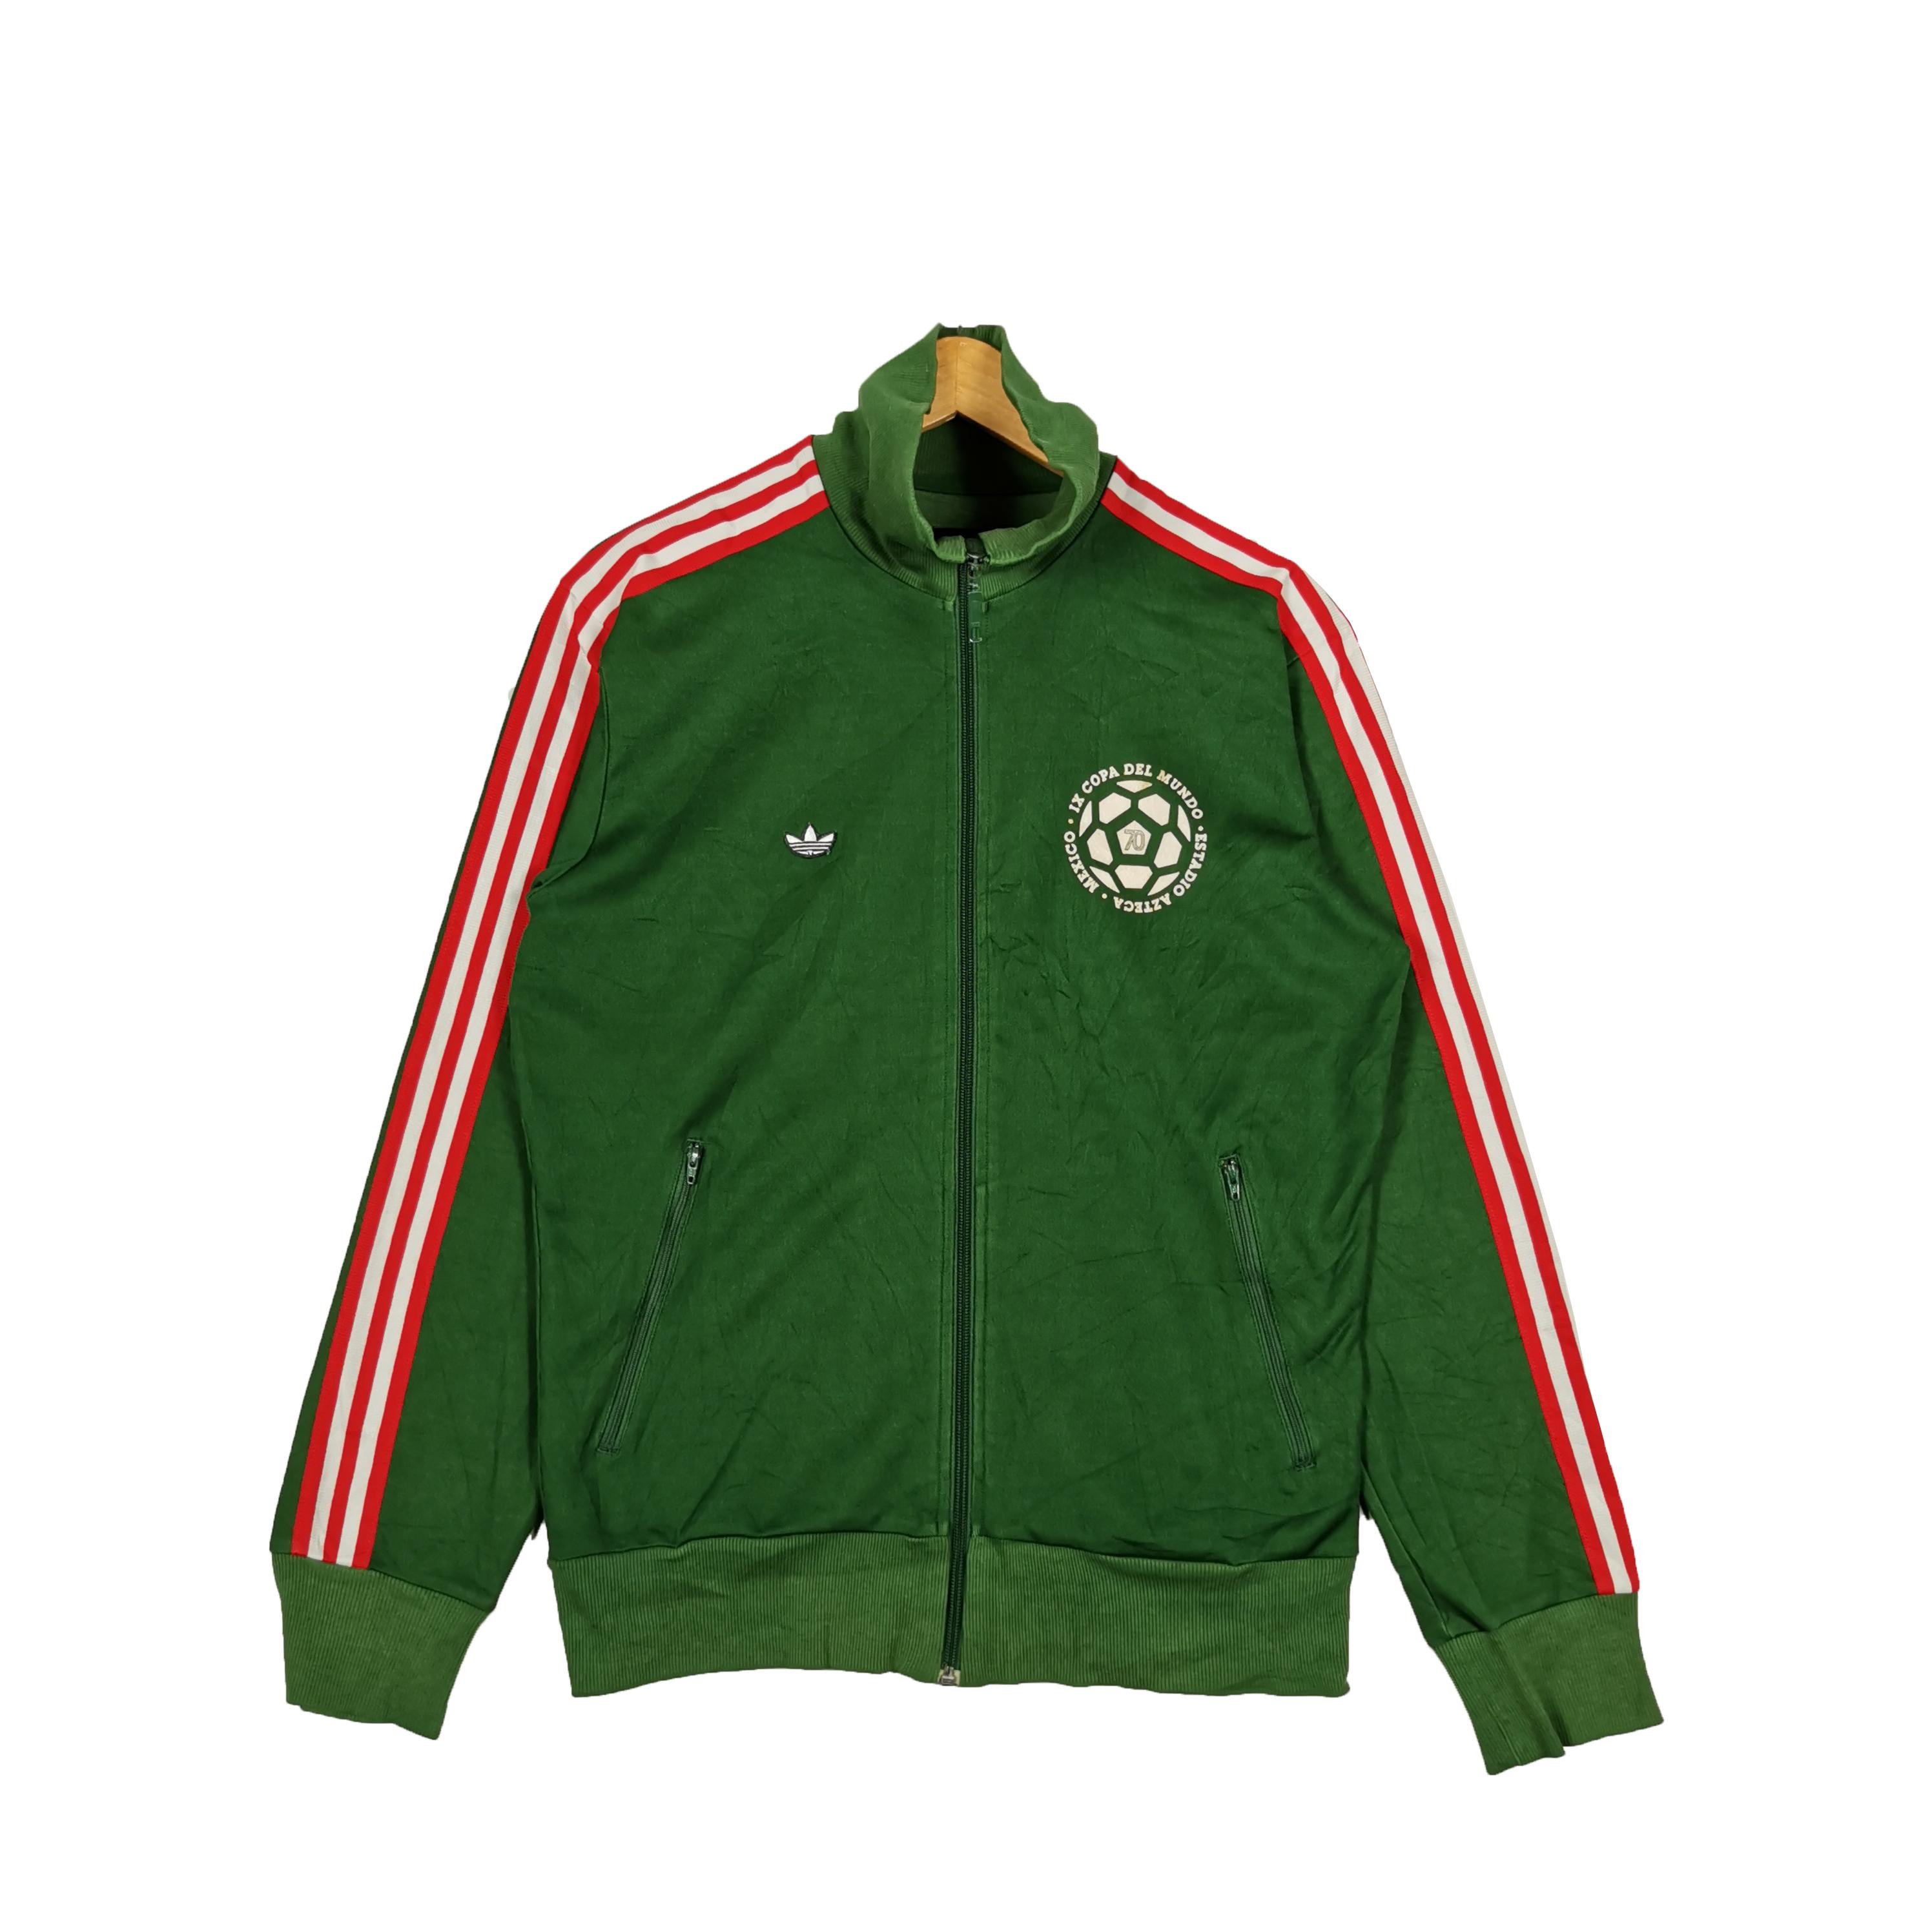 codo Odia Manuscrito  Adidas Adidas Mexico 70 Copa Del Mundo Estadio Azteca Sweater | Grailed